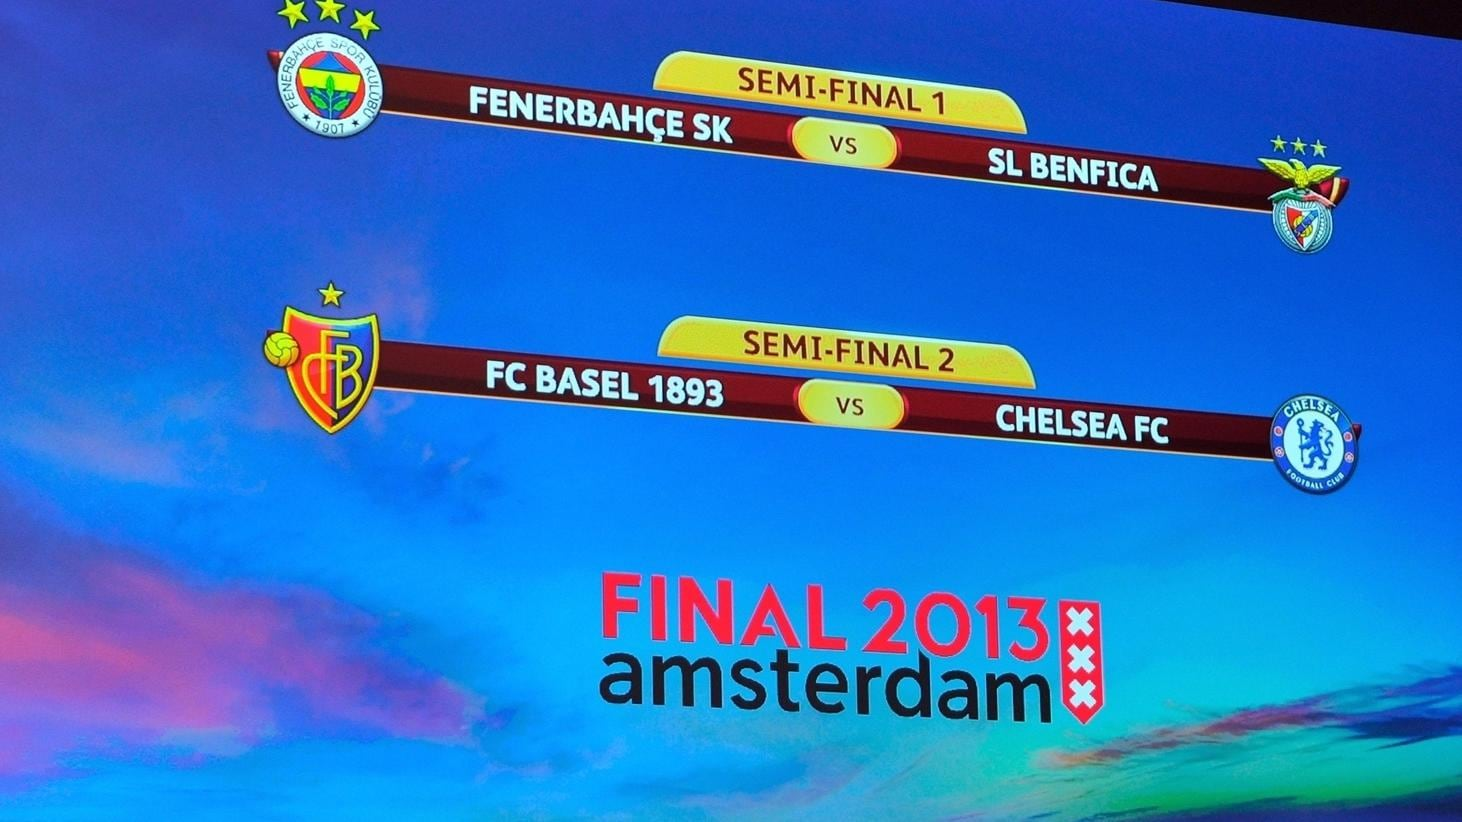 basel up against chelsea fenerbahce face benfica uefa europa league uefa com uefa europa league